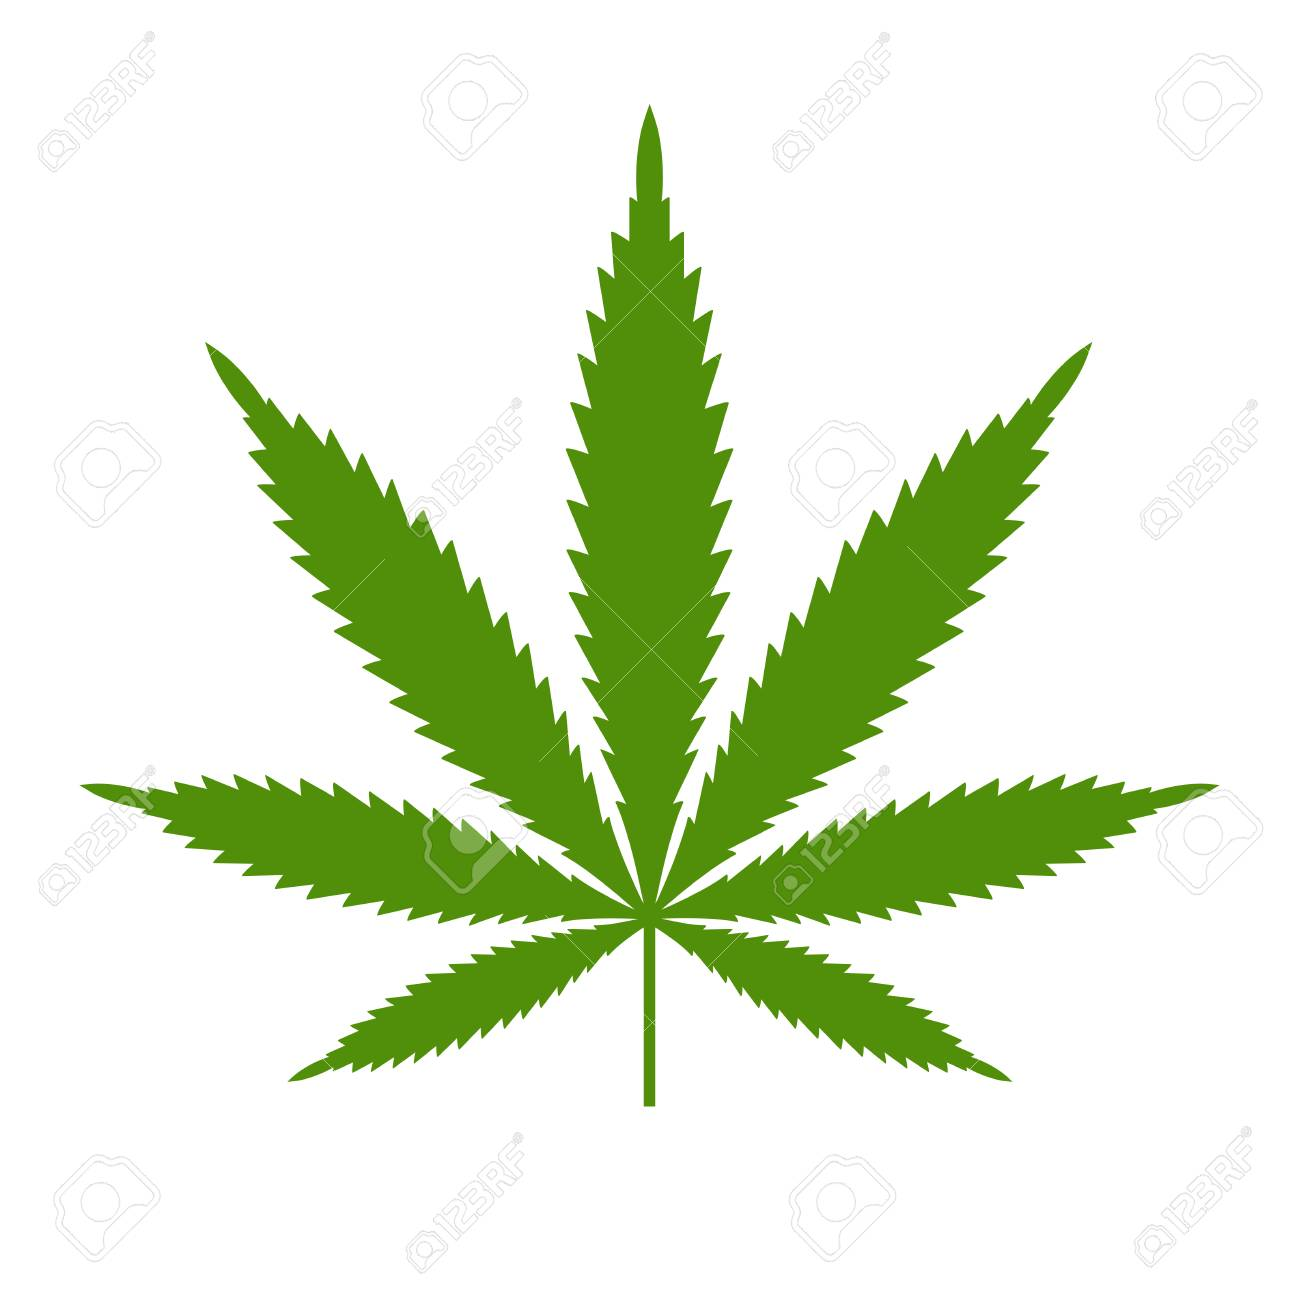 Marijuana or cannabis leaf Icon template isolated illustration on white background. - 98884557